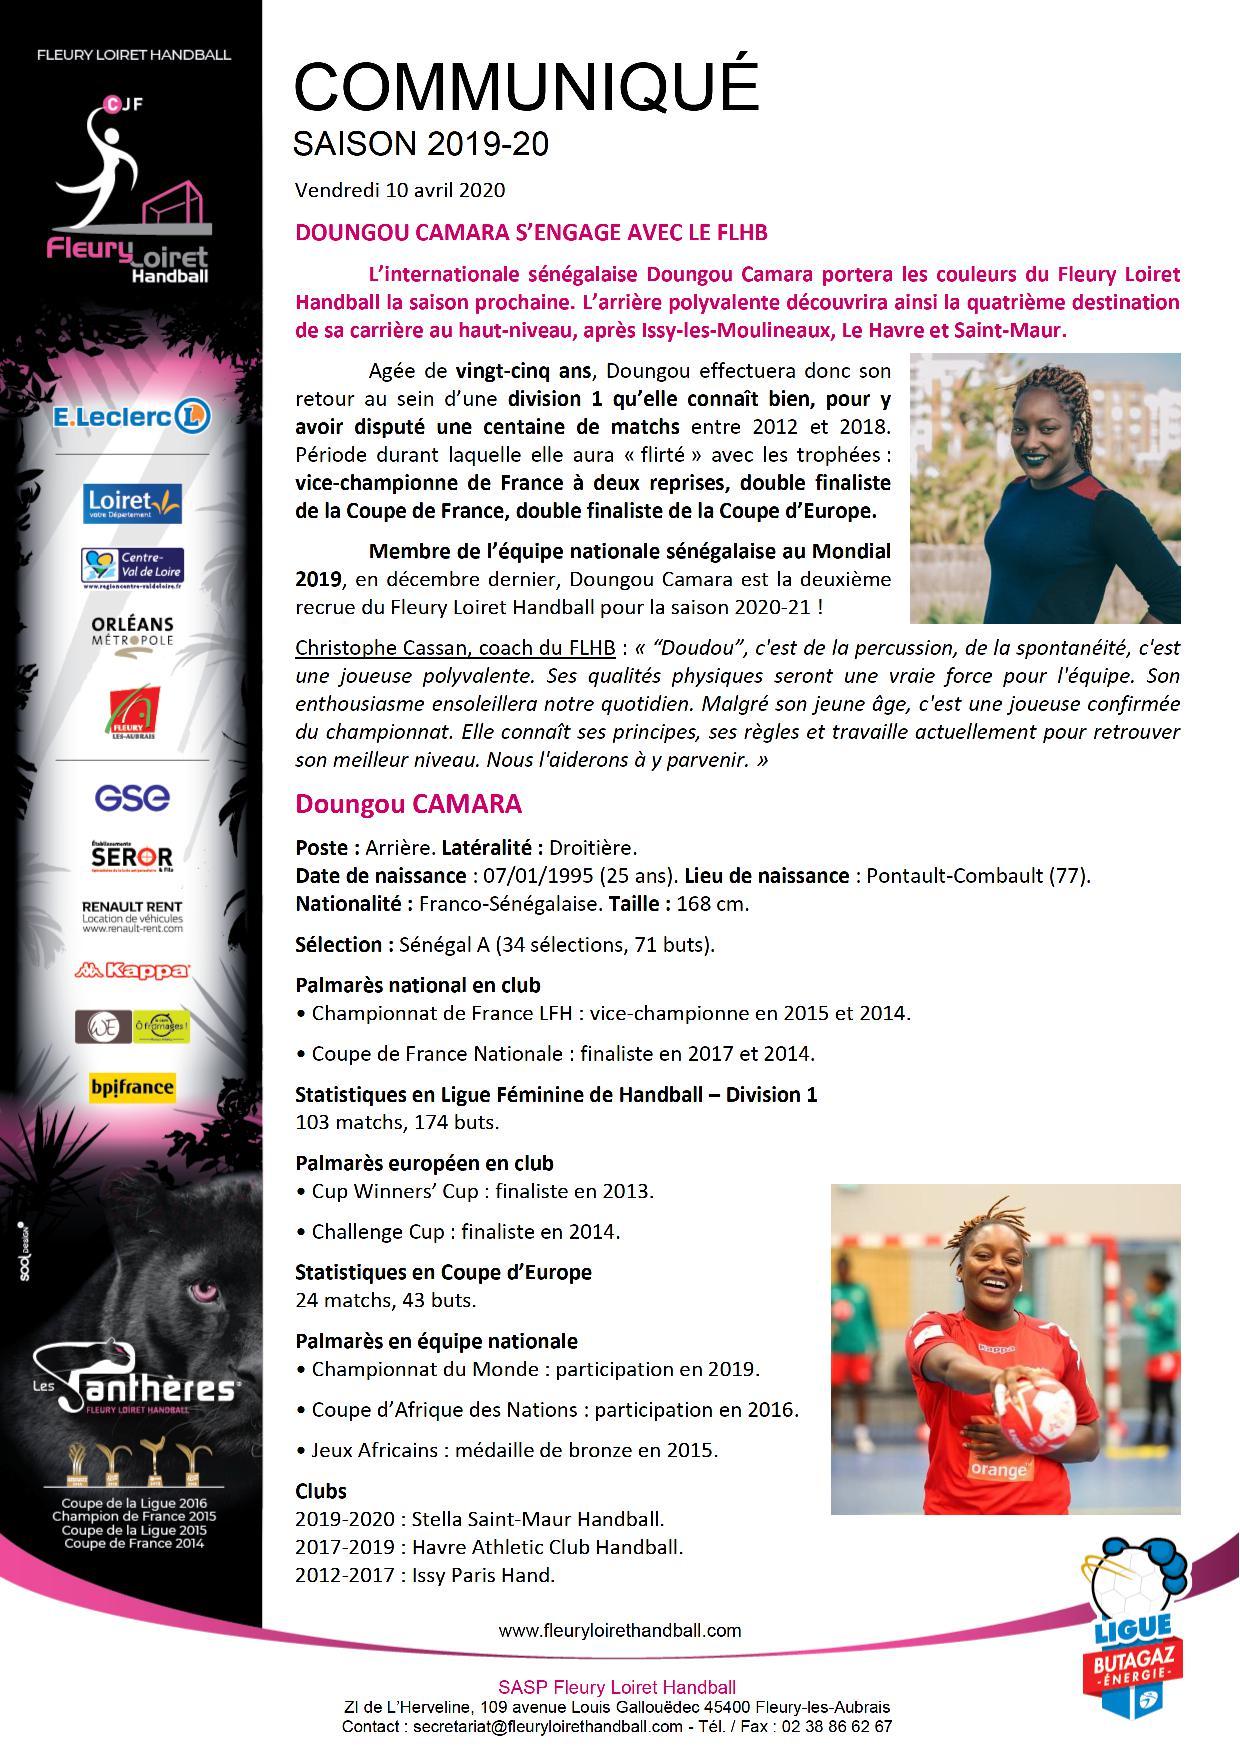 Communiqué Fleury Loiret Handball - Vendredi 10 avril 2020.jpg